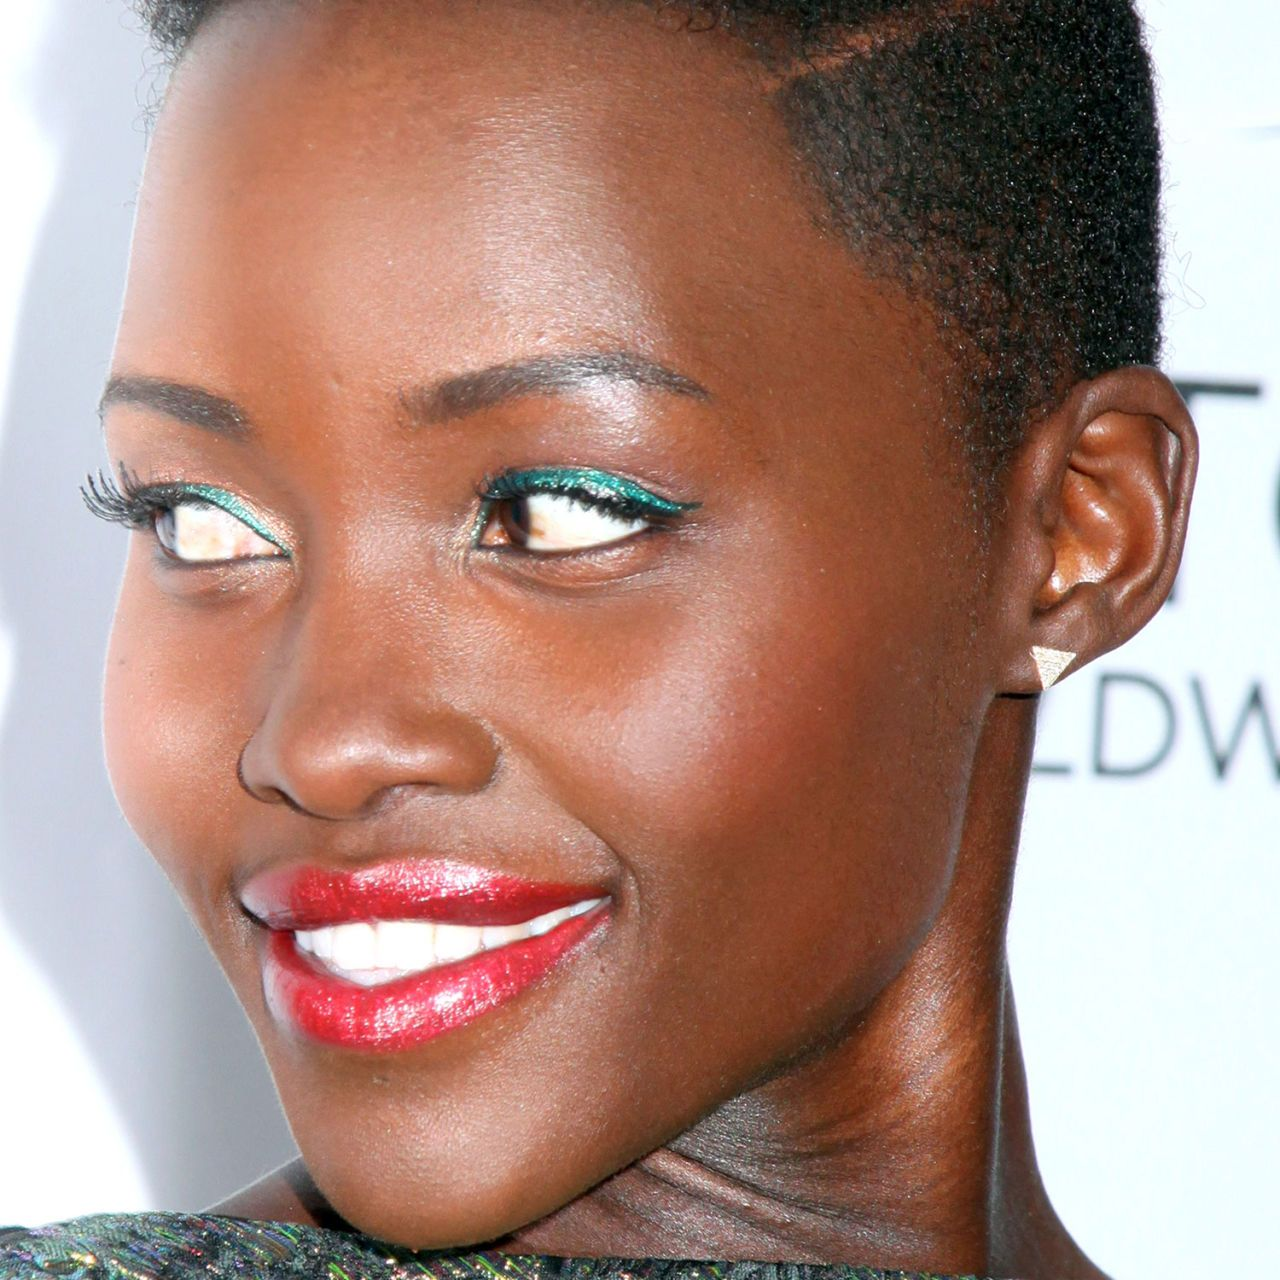 10 New Ways to Wear Eyeliner